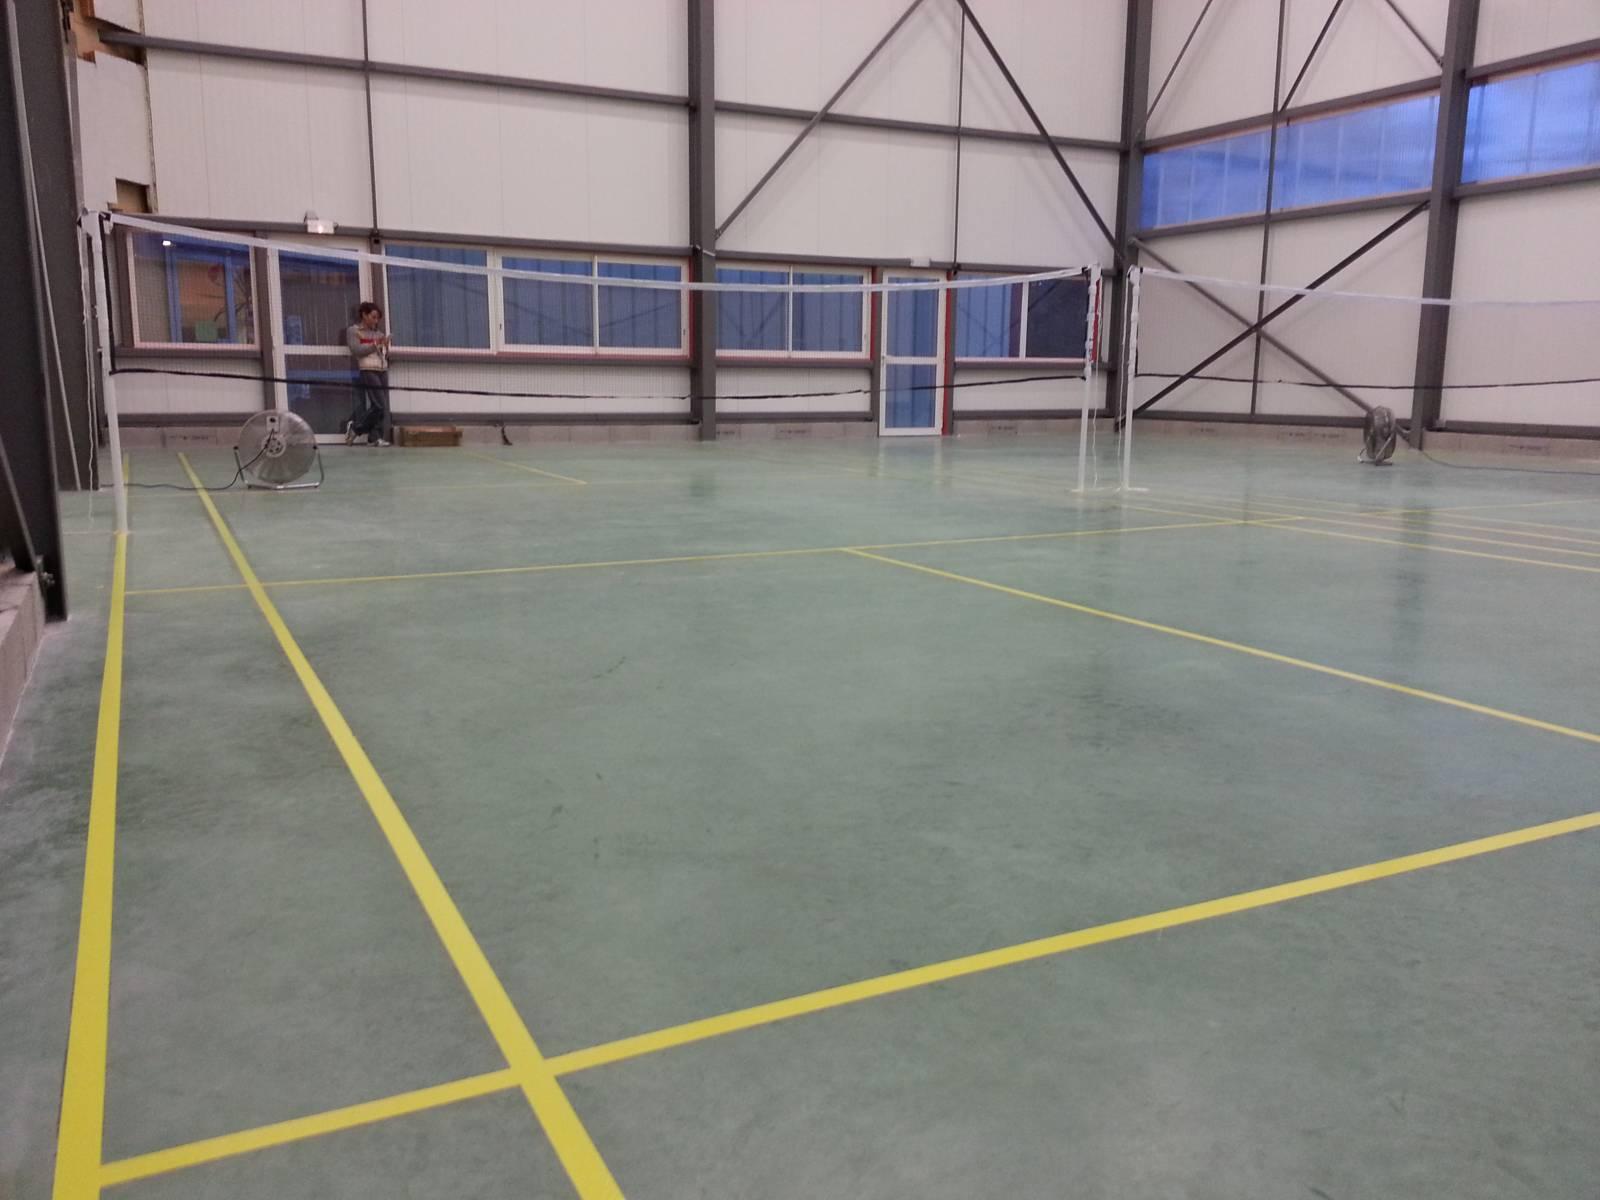 Location terrain de badminton montpellier montpellier for Terrain montpellier